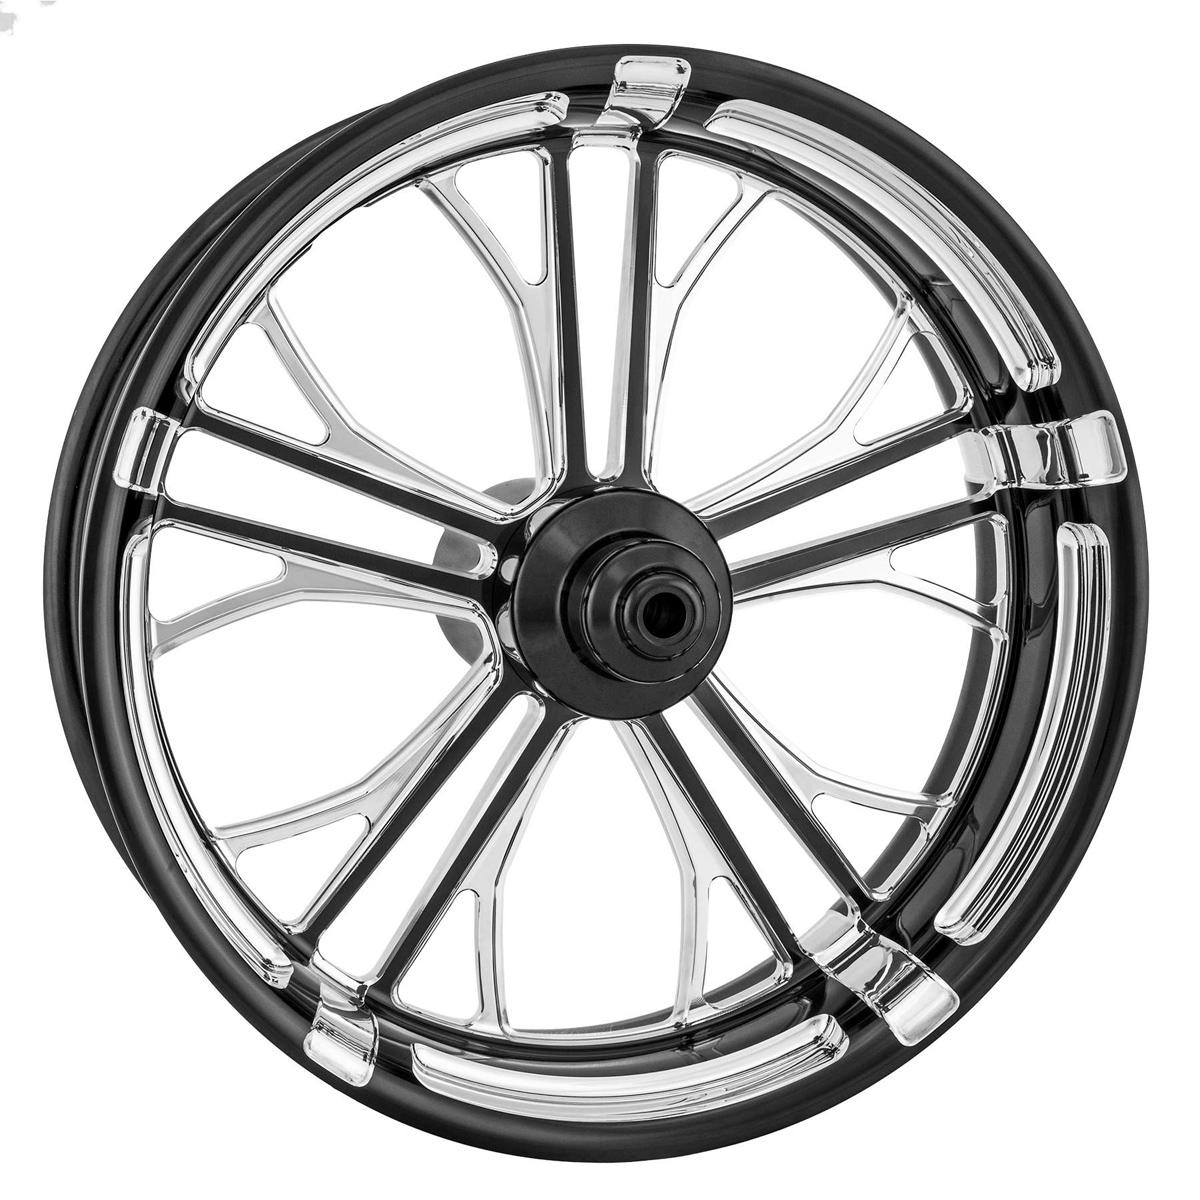 Performance Machine Dixon Platinum Cut Front Wheel 23x3.5 Non-ABS